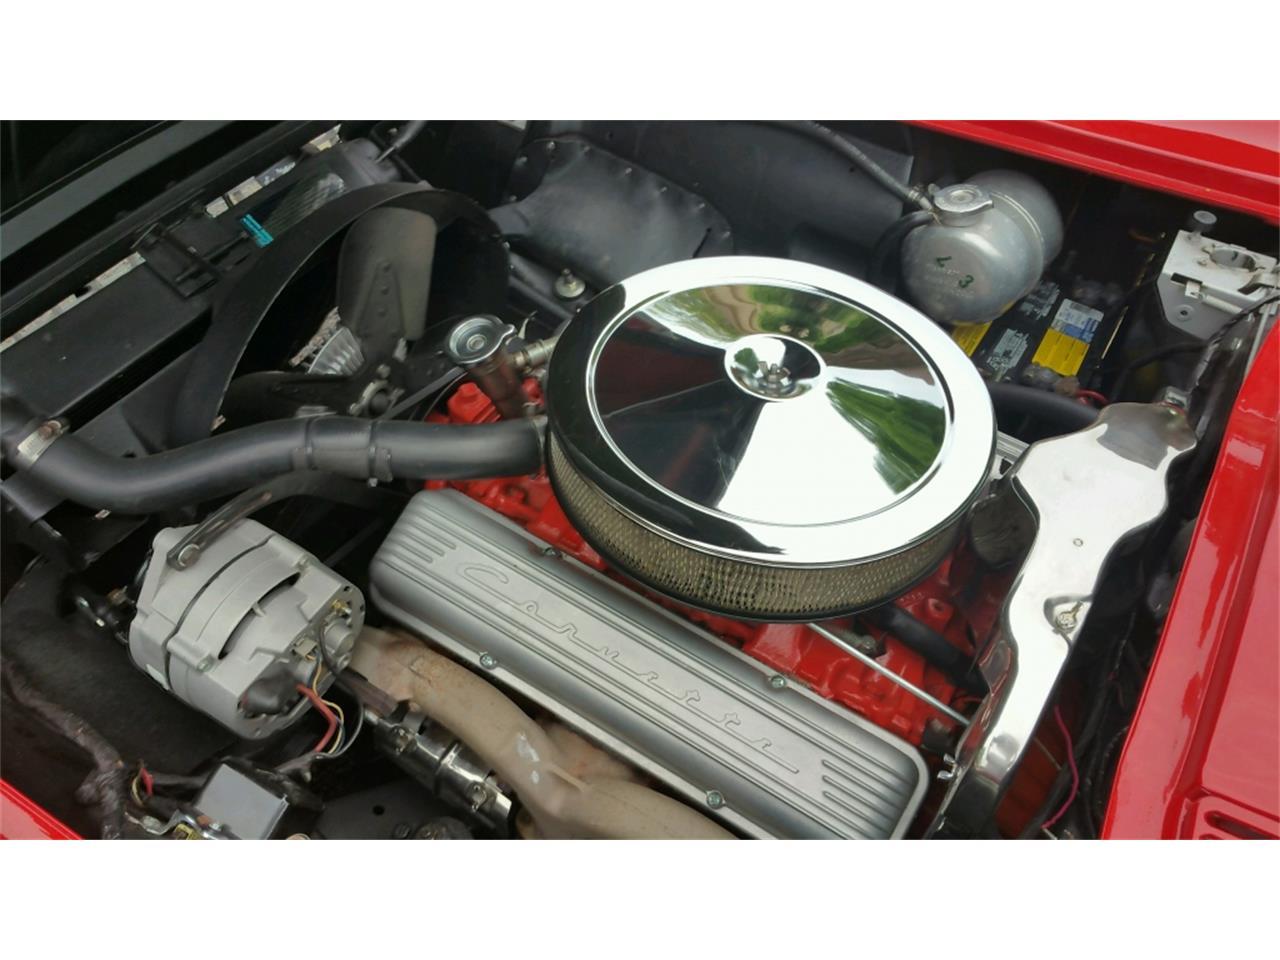 Large Picture of '66 Chevrolet Corvette located in Missouri - $59,995.00 - MO25